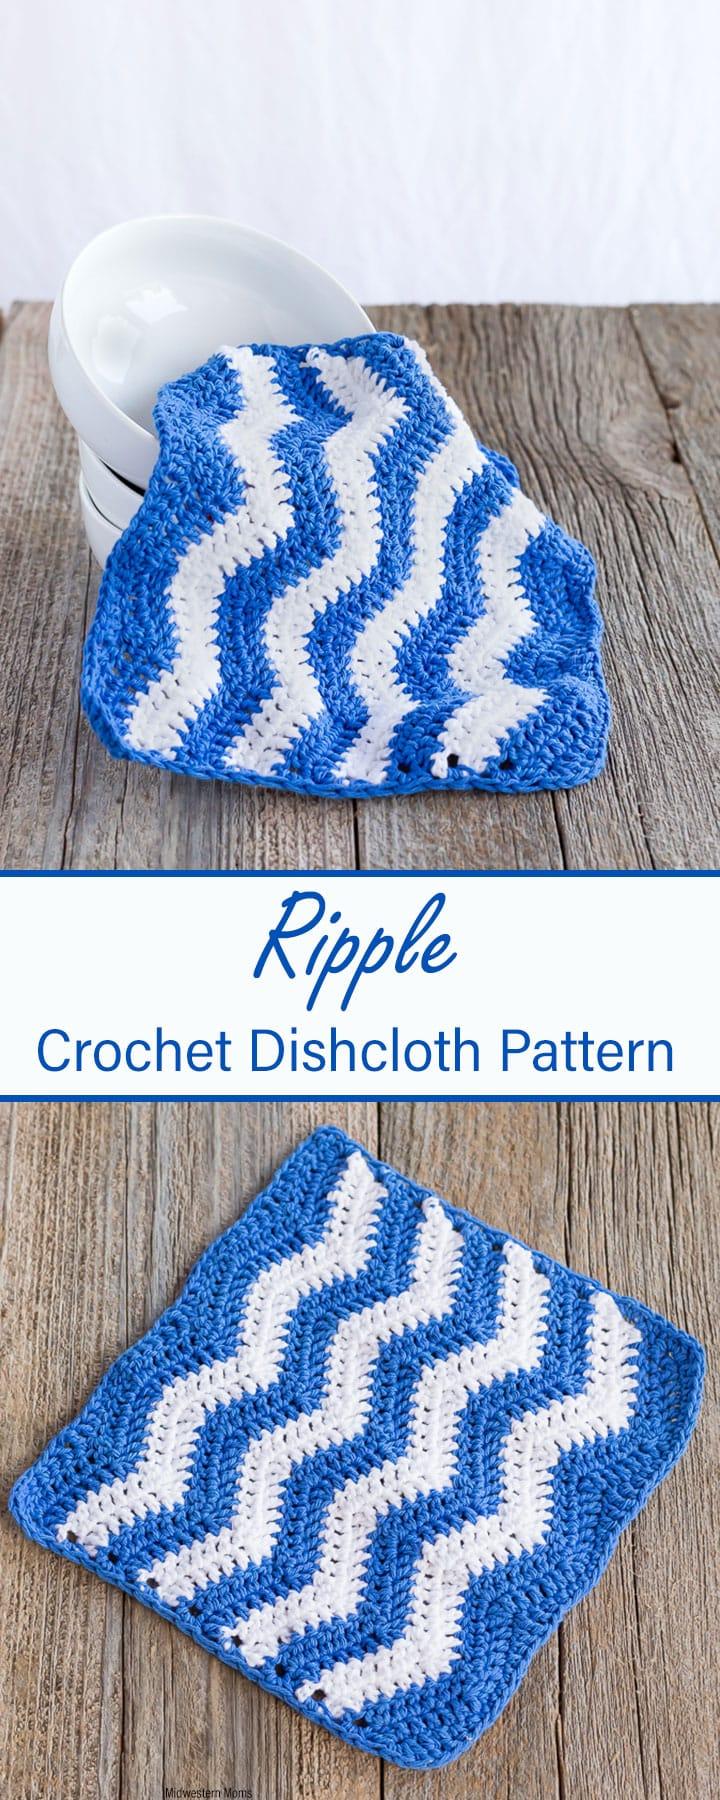 Easy Ripple Crochet Dishcloth Pattern! Choose 2 alternating colors to make a fun ripple design!